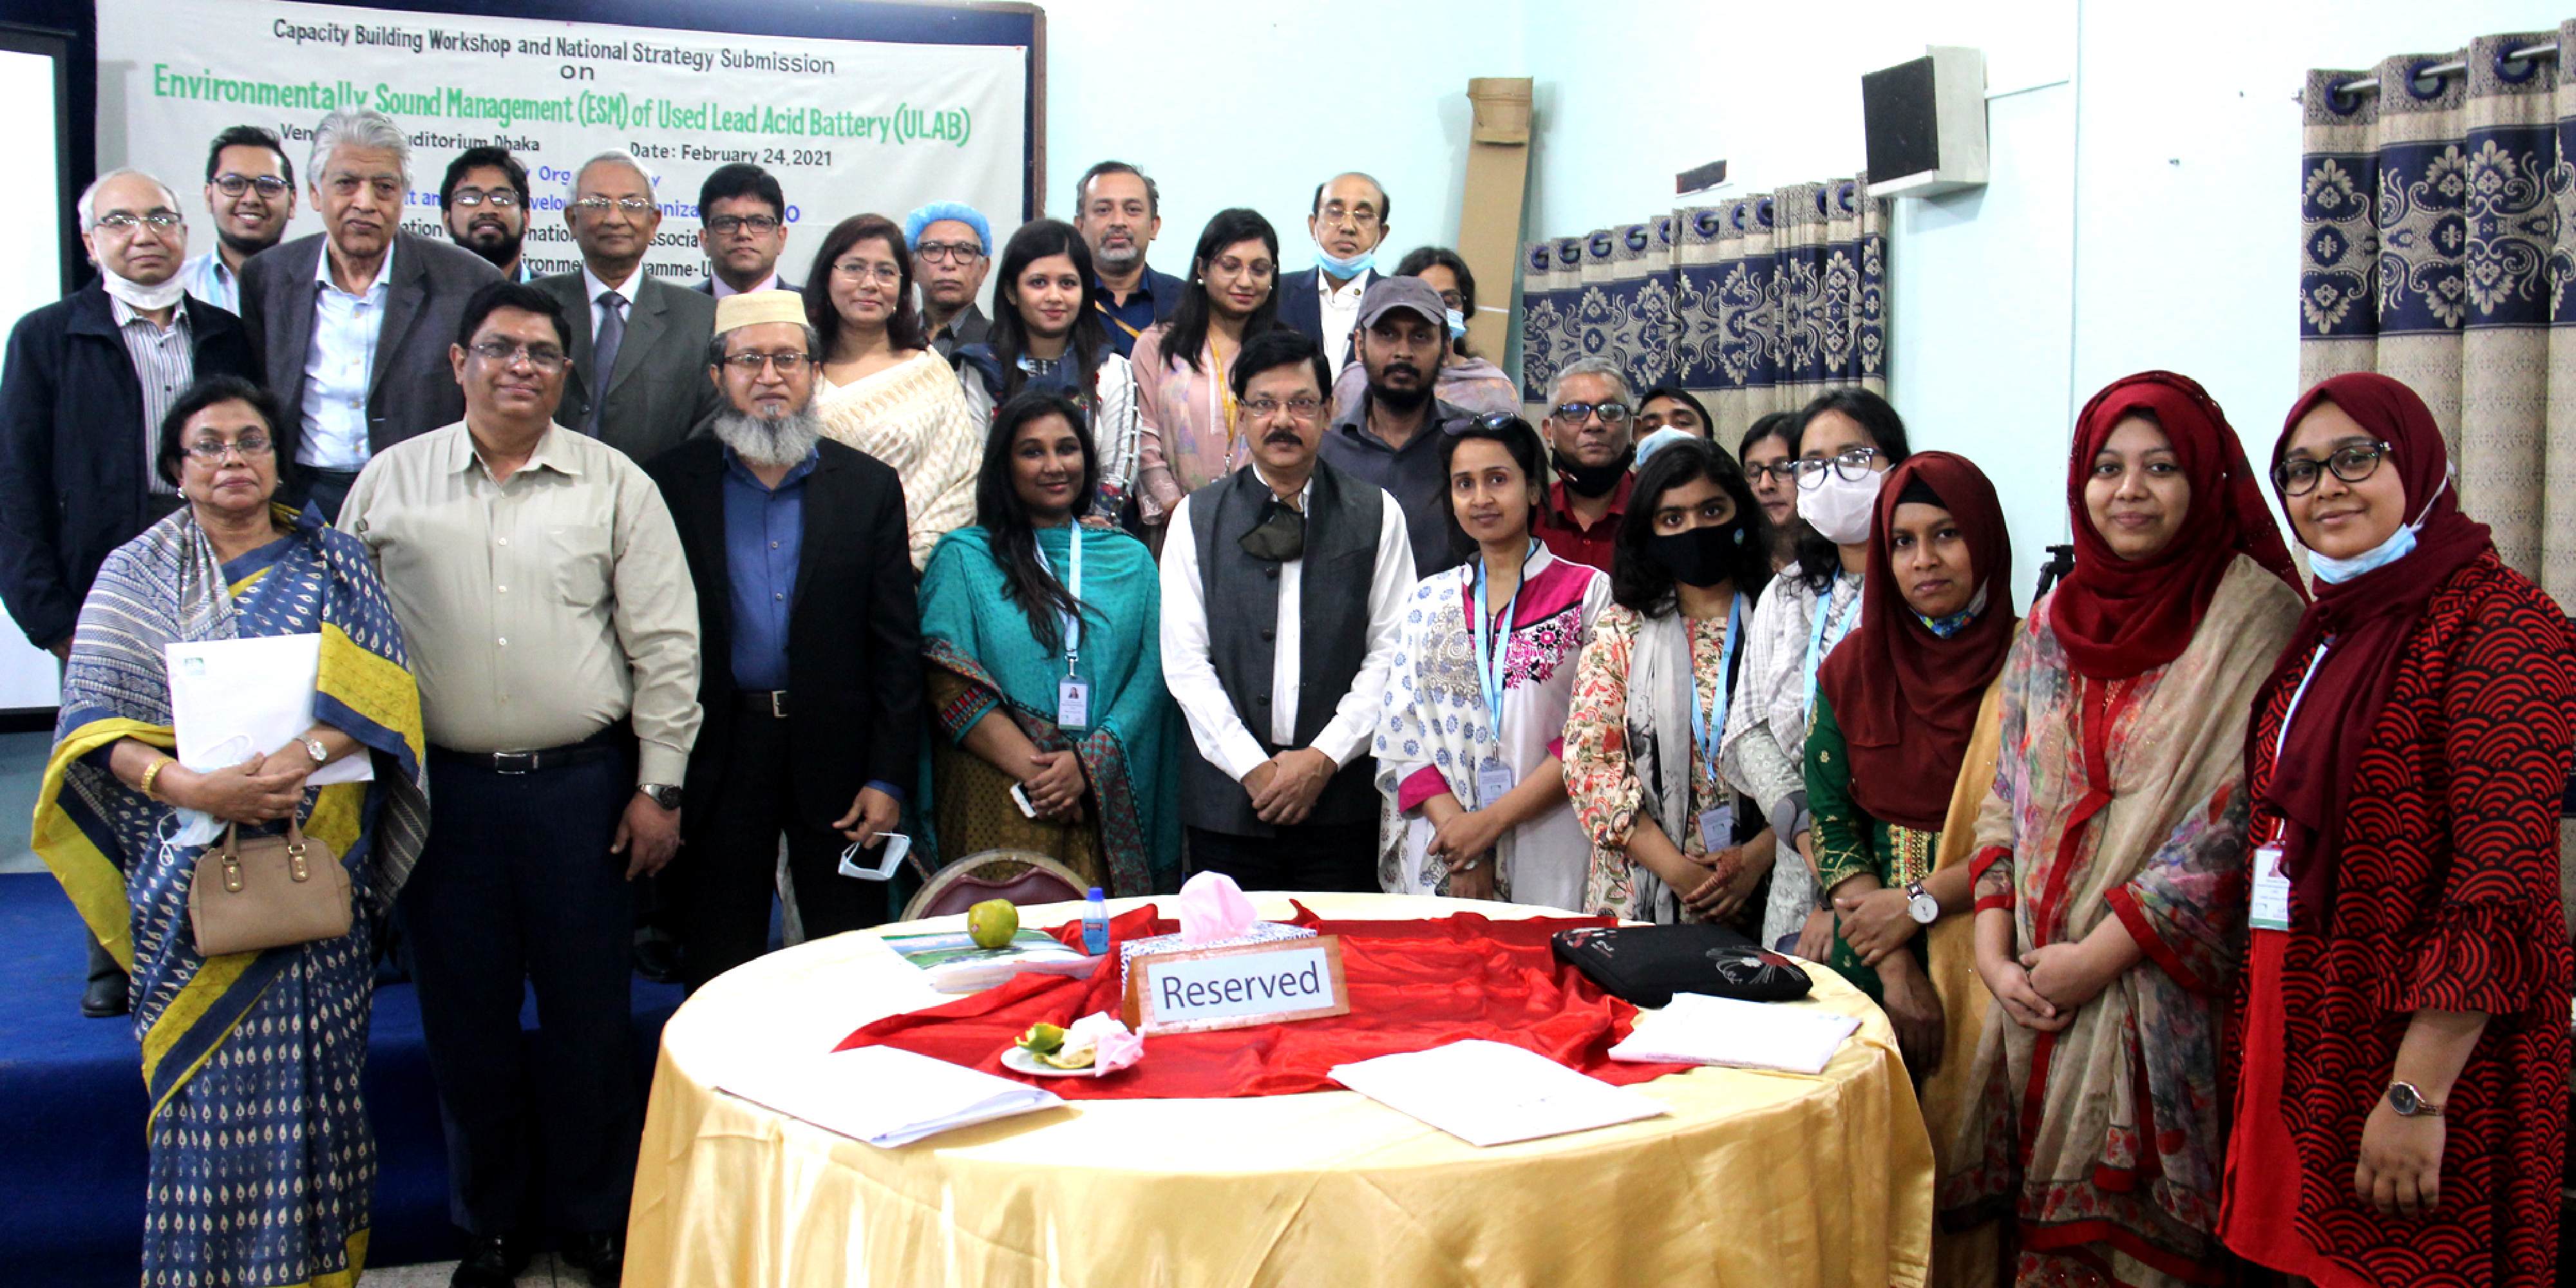 Environmentally Sound Management ULAB An Urgent Need in Bangladesh